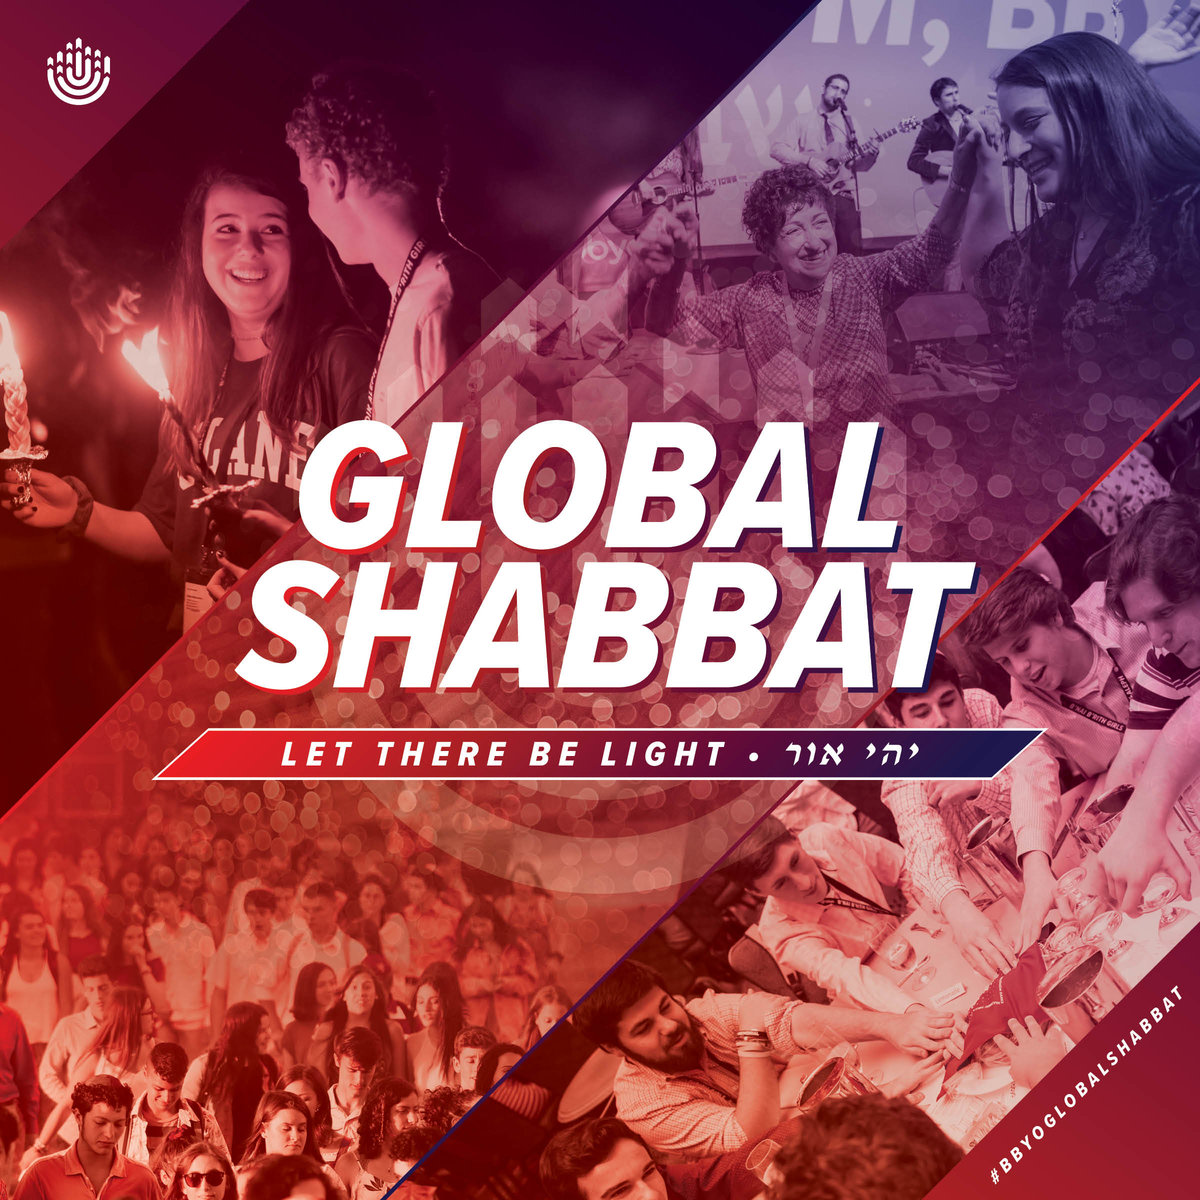 BBYO CRW Global Shabbat Let There Be Light image